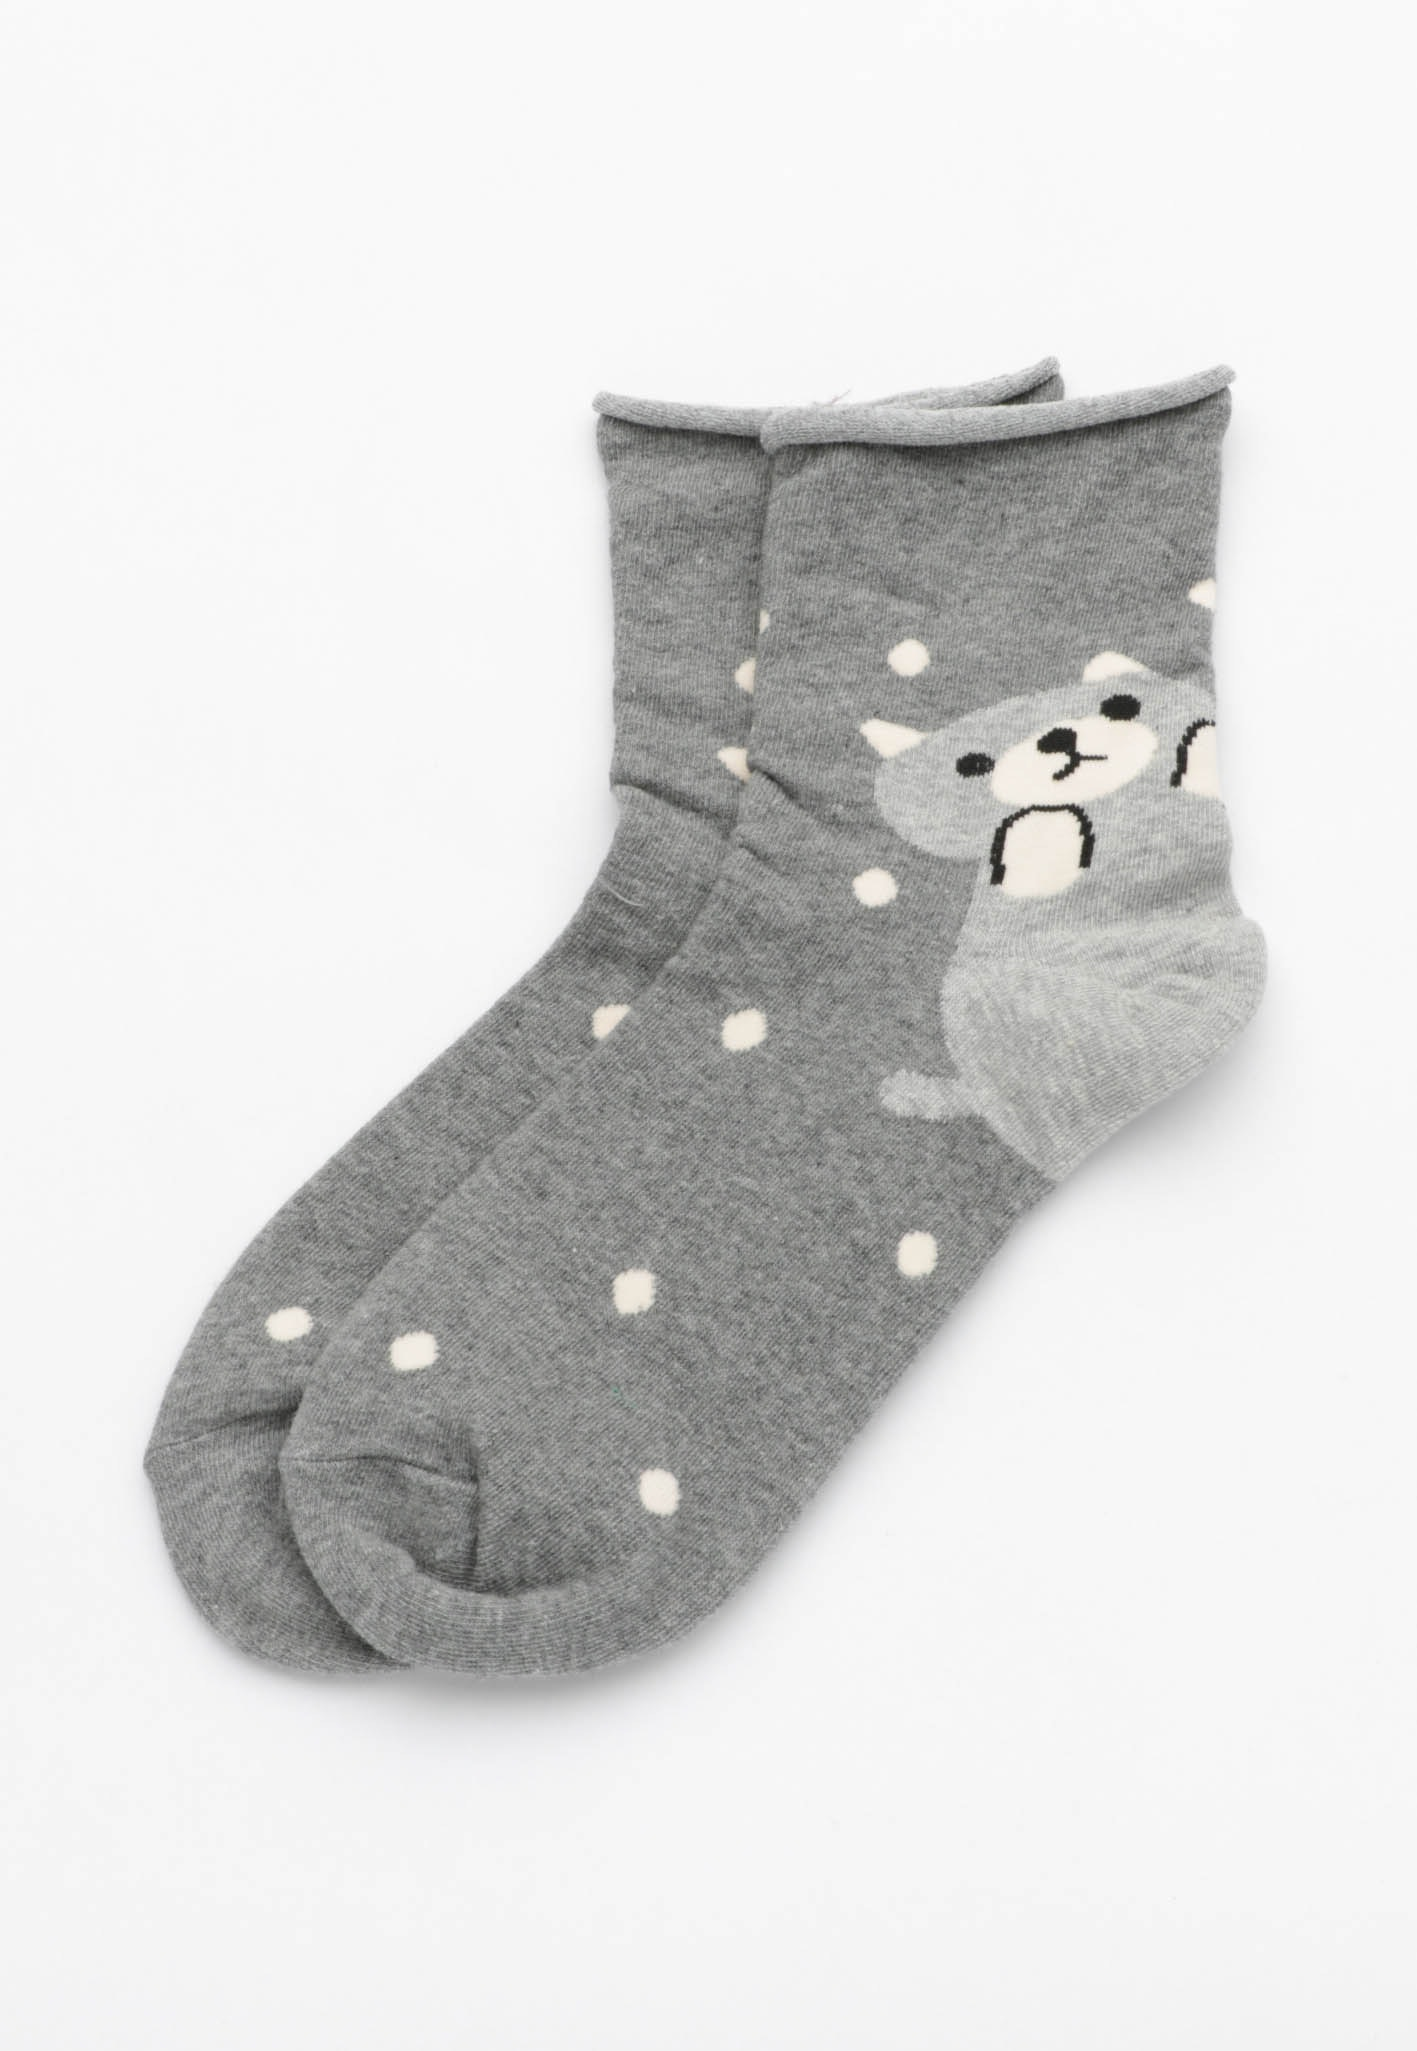 Snowing Bear Socks - Grey Marle